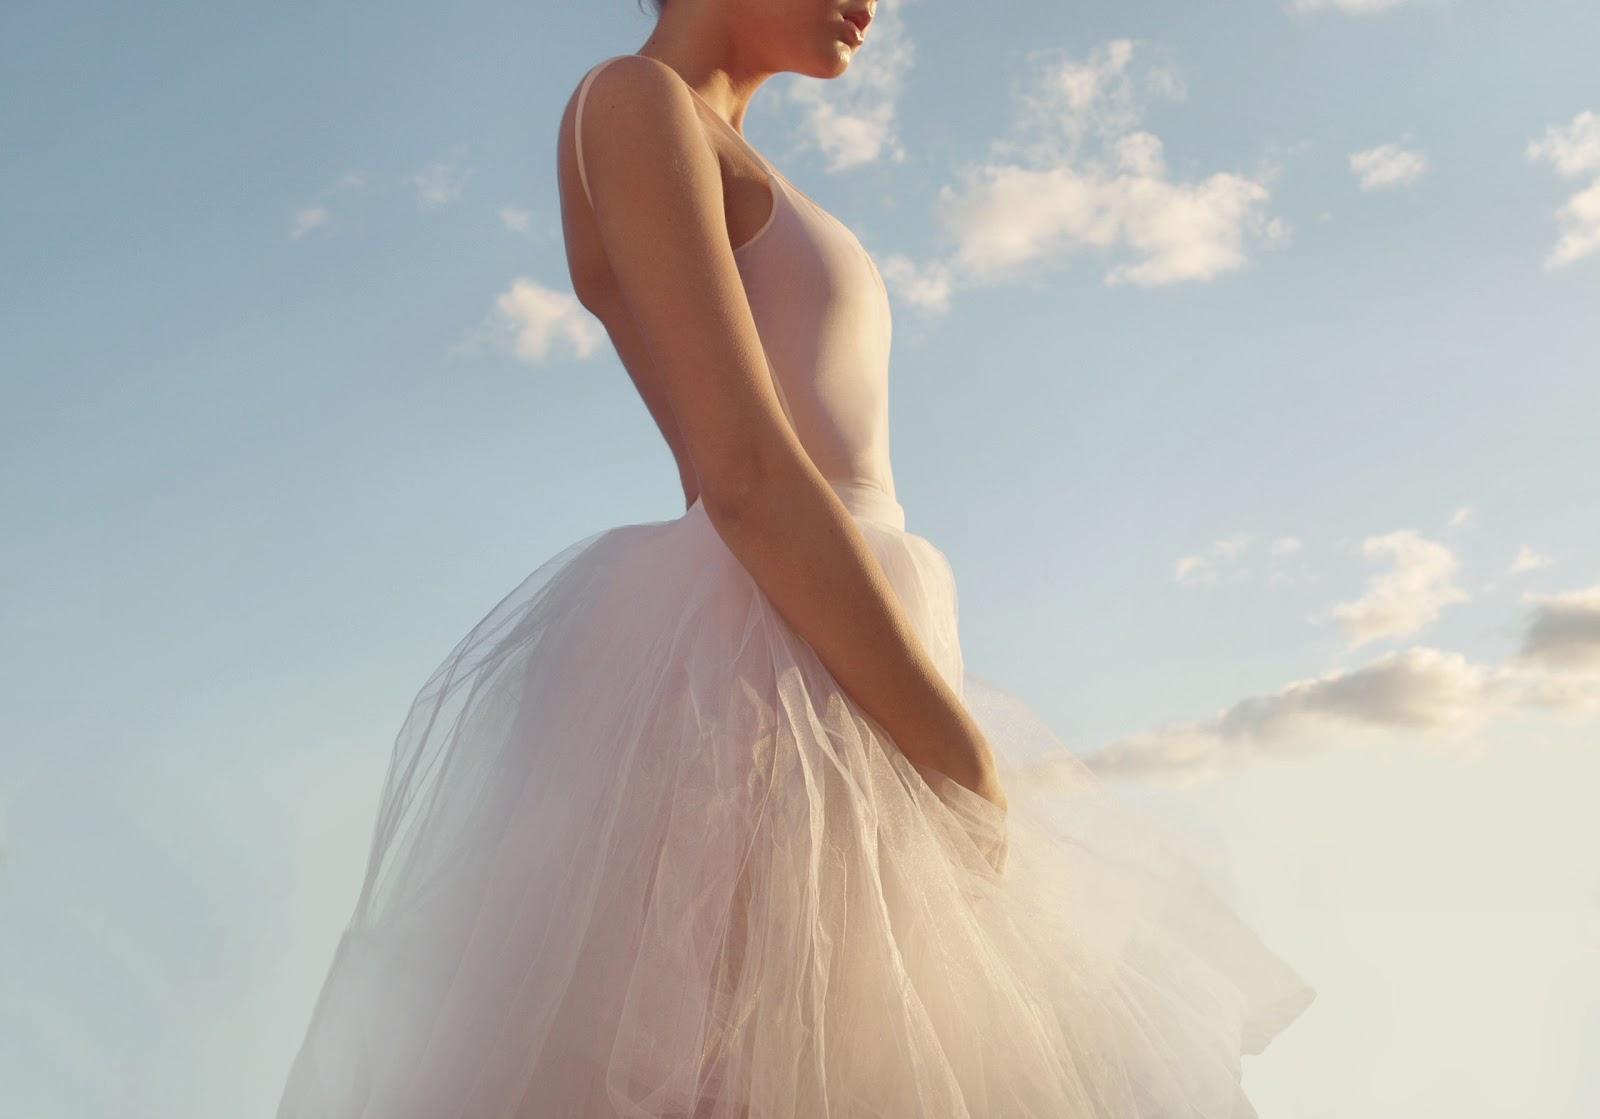 http://4.bp.blogspot.com/-6yCX-K_lt98/T7gwpB-ZMMI/AAAAAAAAB1g/bn9lvzWiKHg/s1600/balerina8.jpg